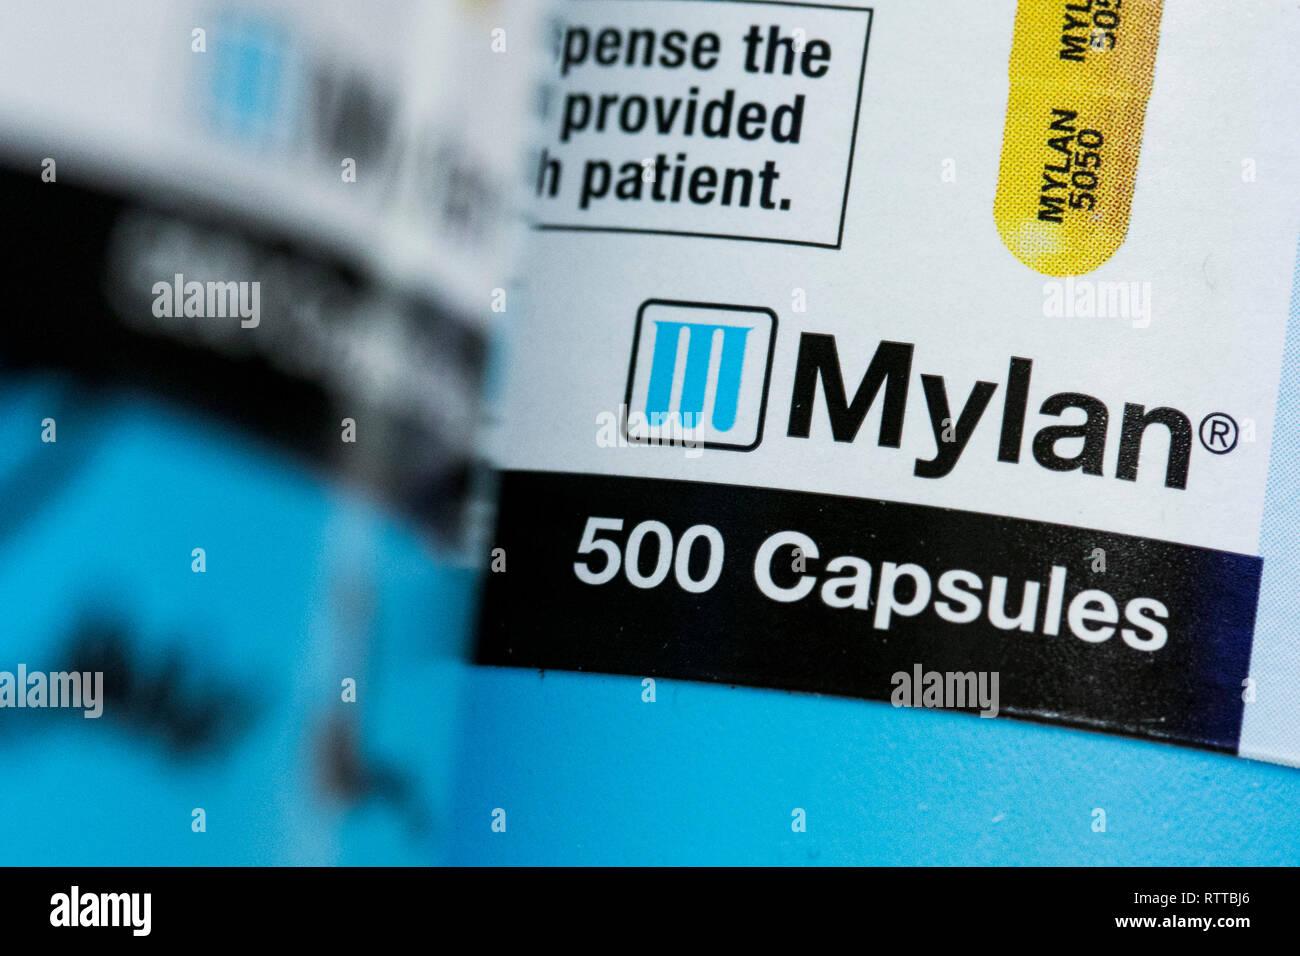 A Mylan logo is seen on prescription pharmaceutical packaging